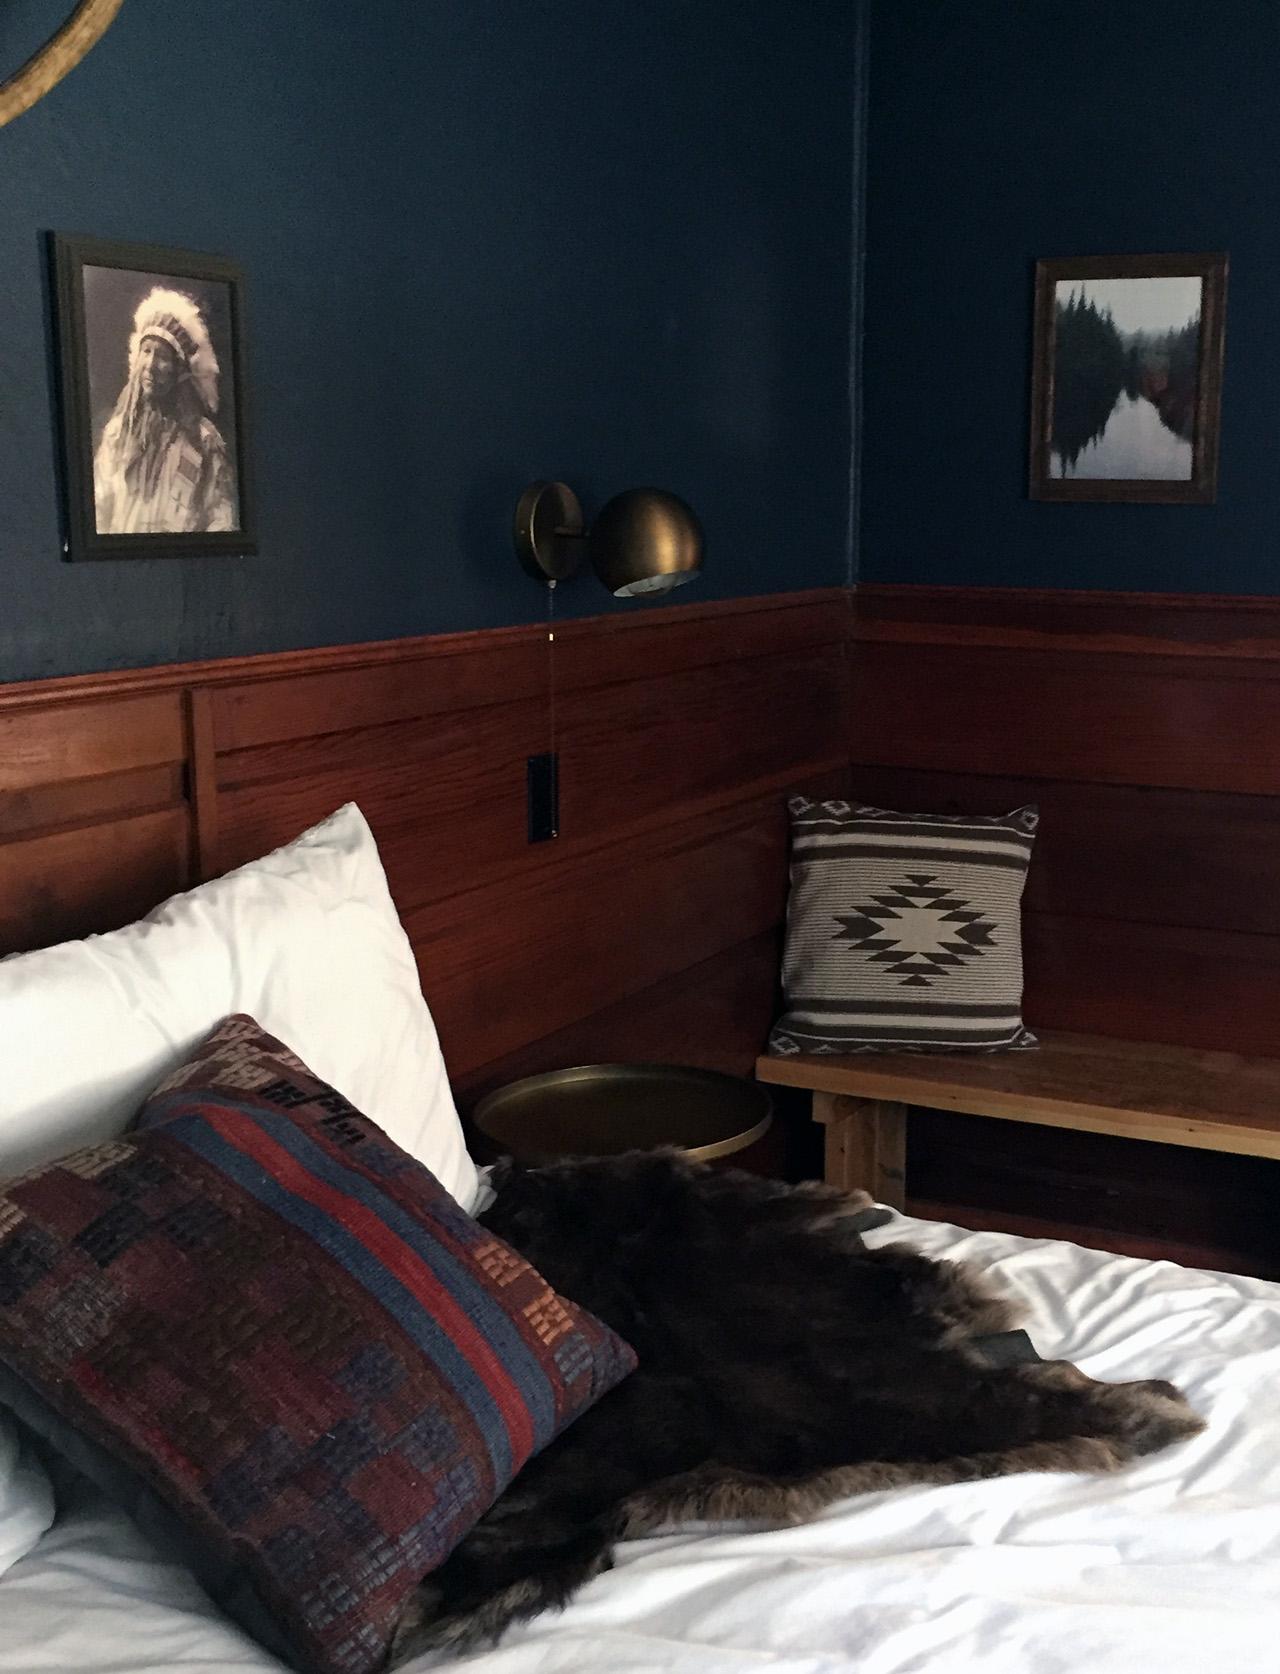 Noon Lodge in Big Bear